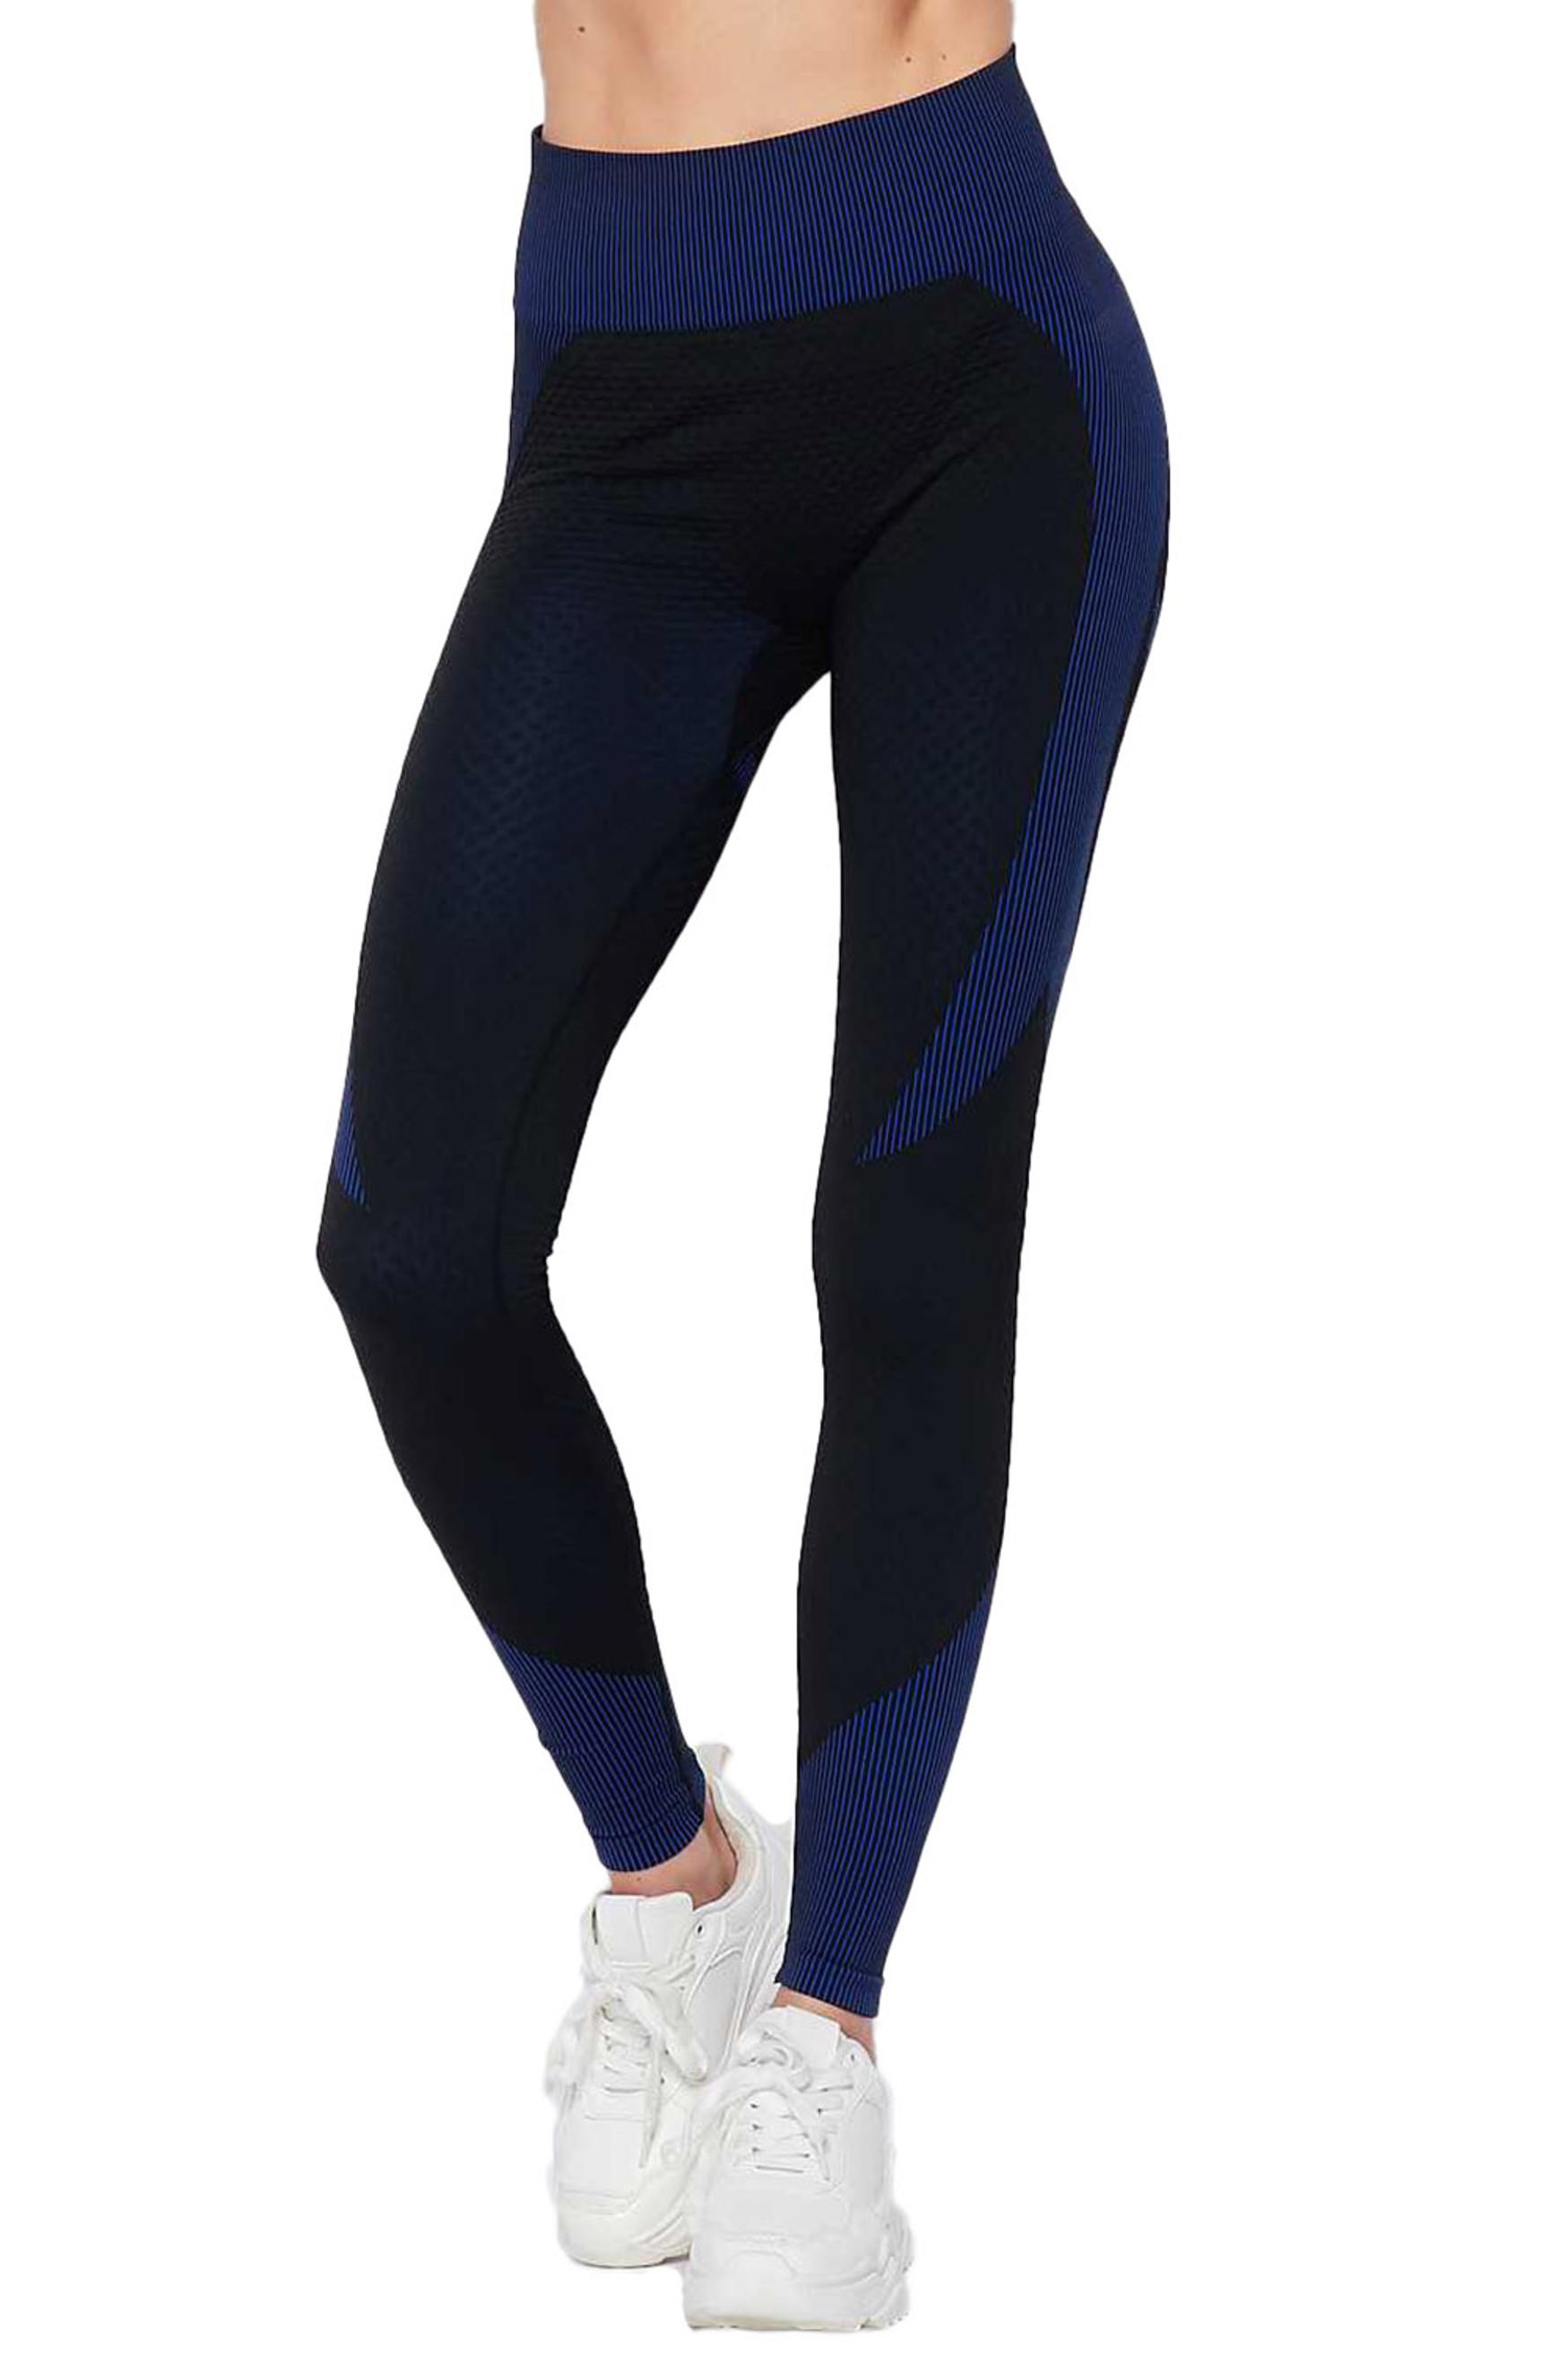 Sexy Contouring Body Hug Workout Leggings